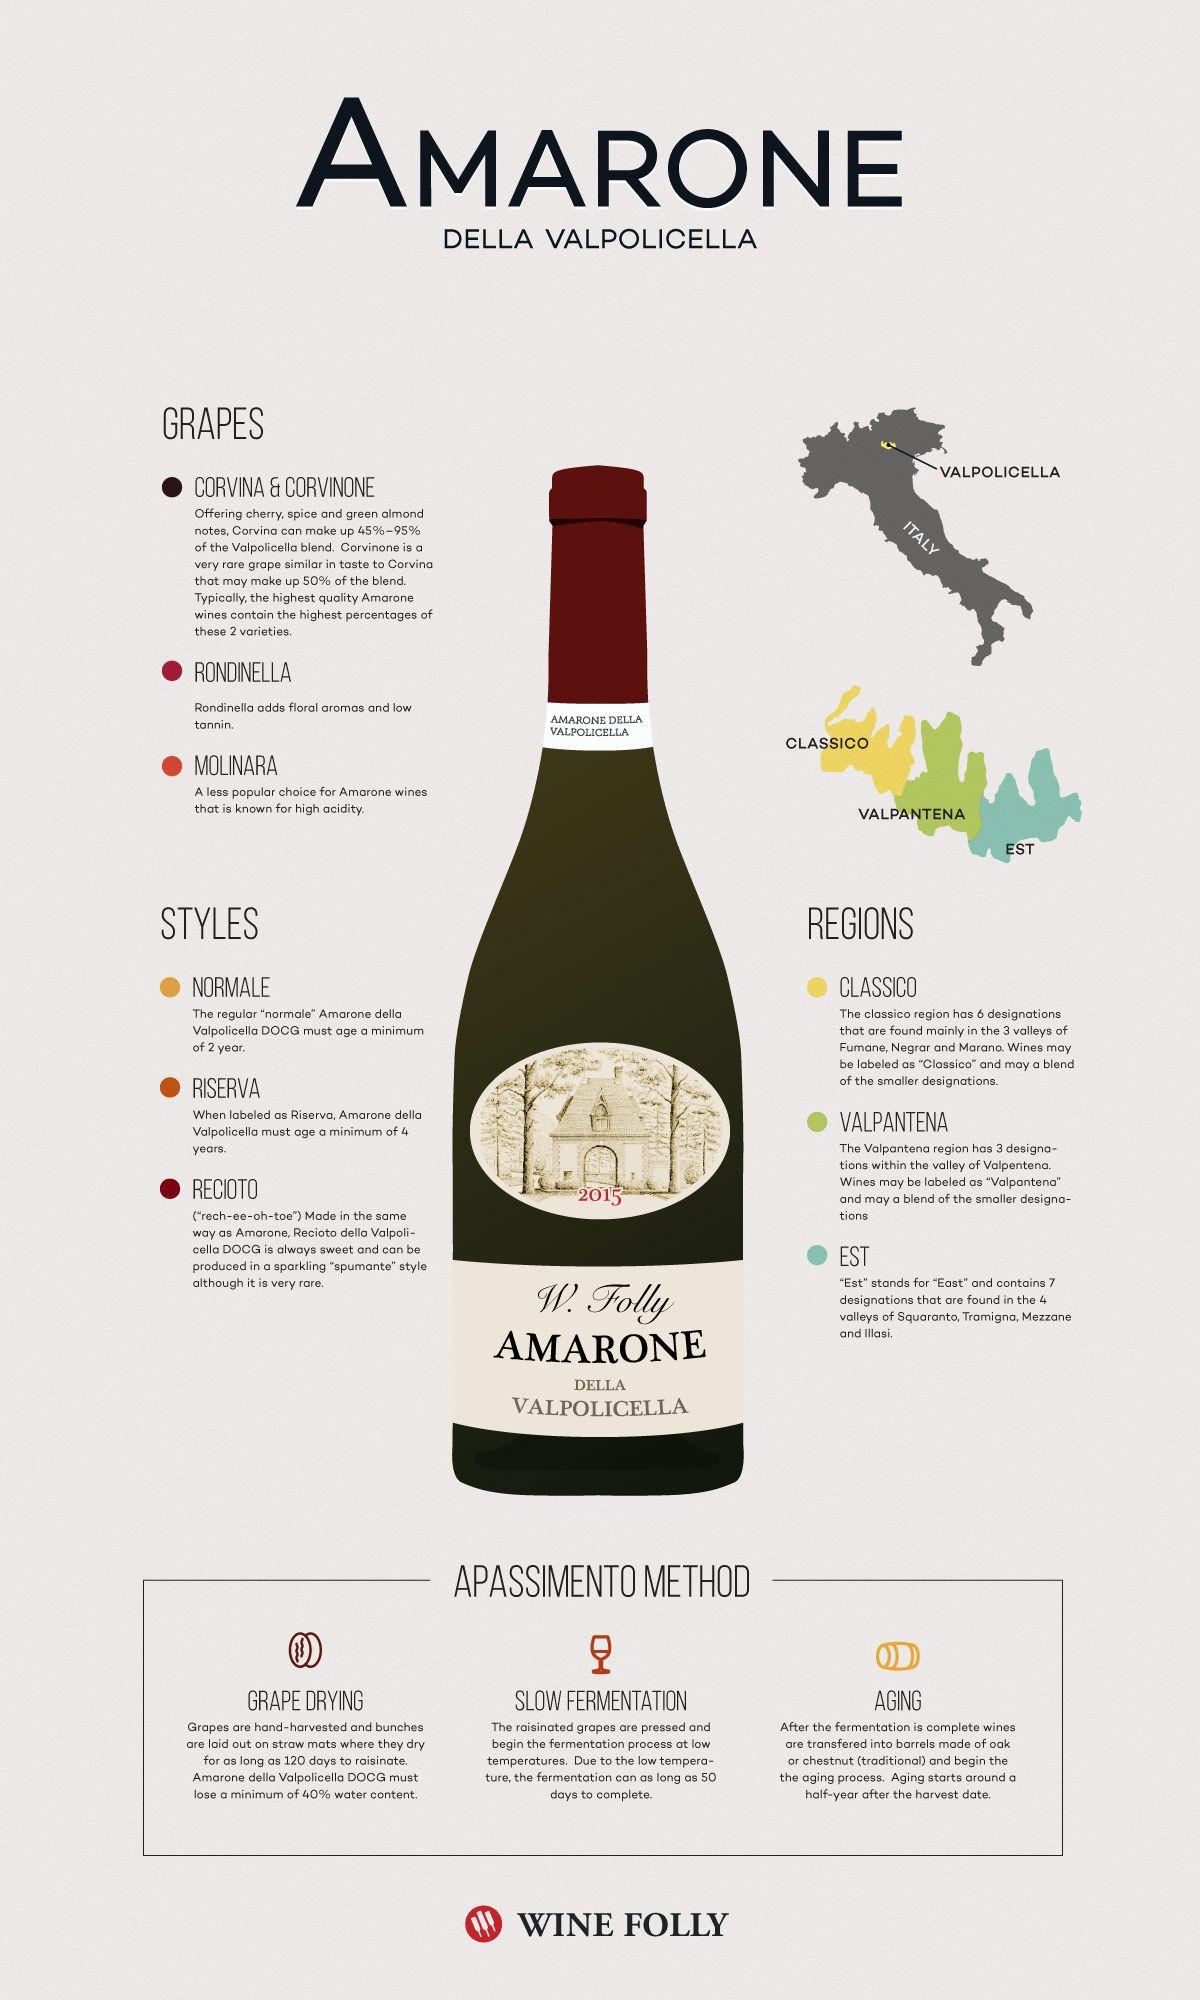 Amarone wine guide - http://winefolly.com/review/amarone-wine-turns-raisins-into-gold/